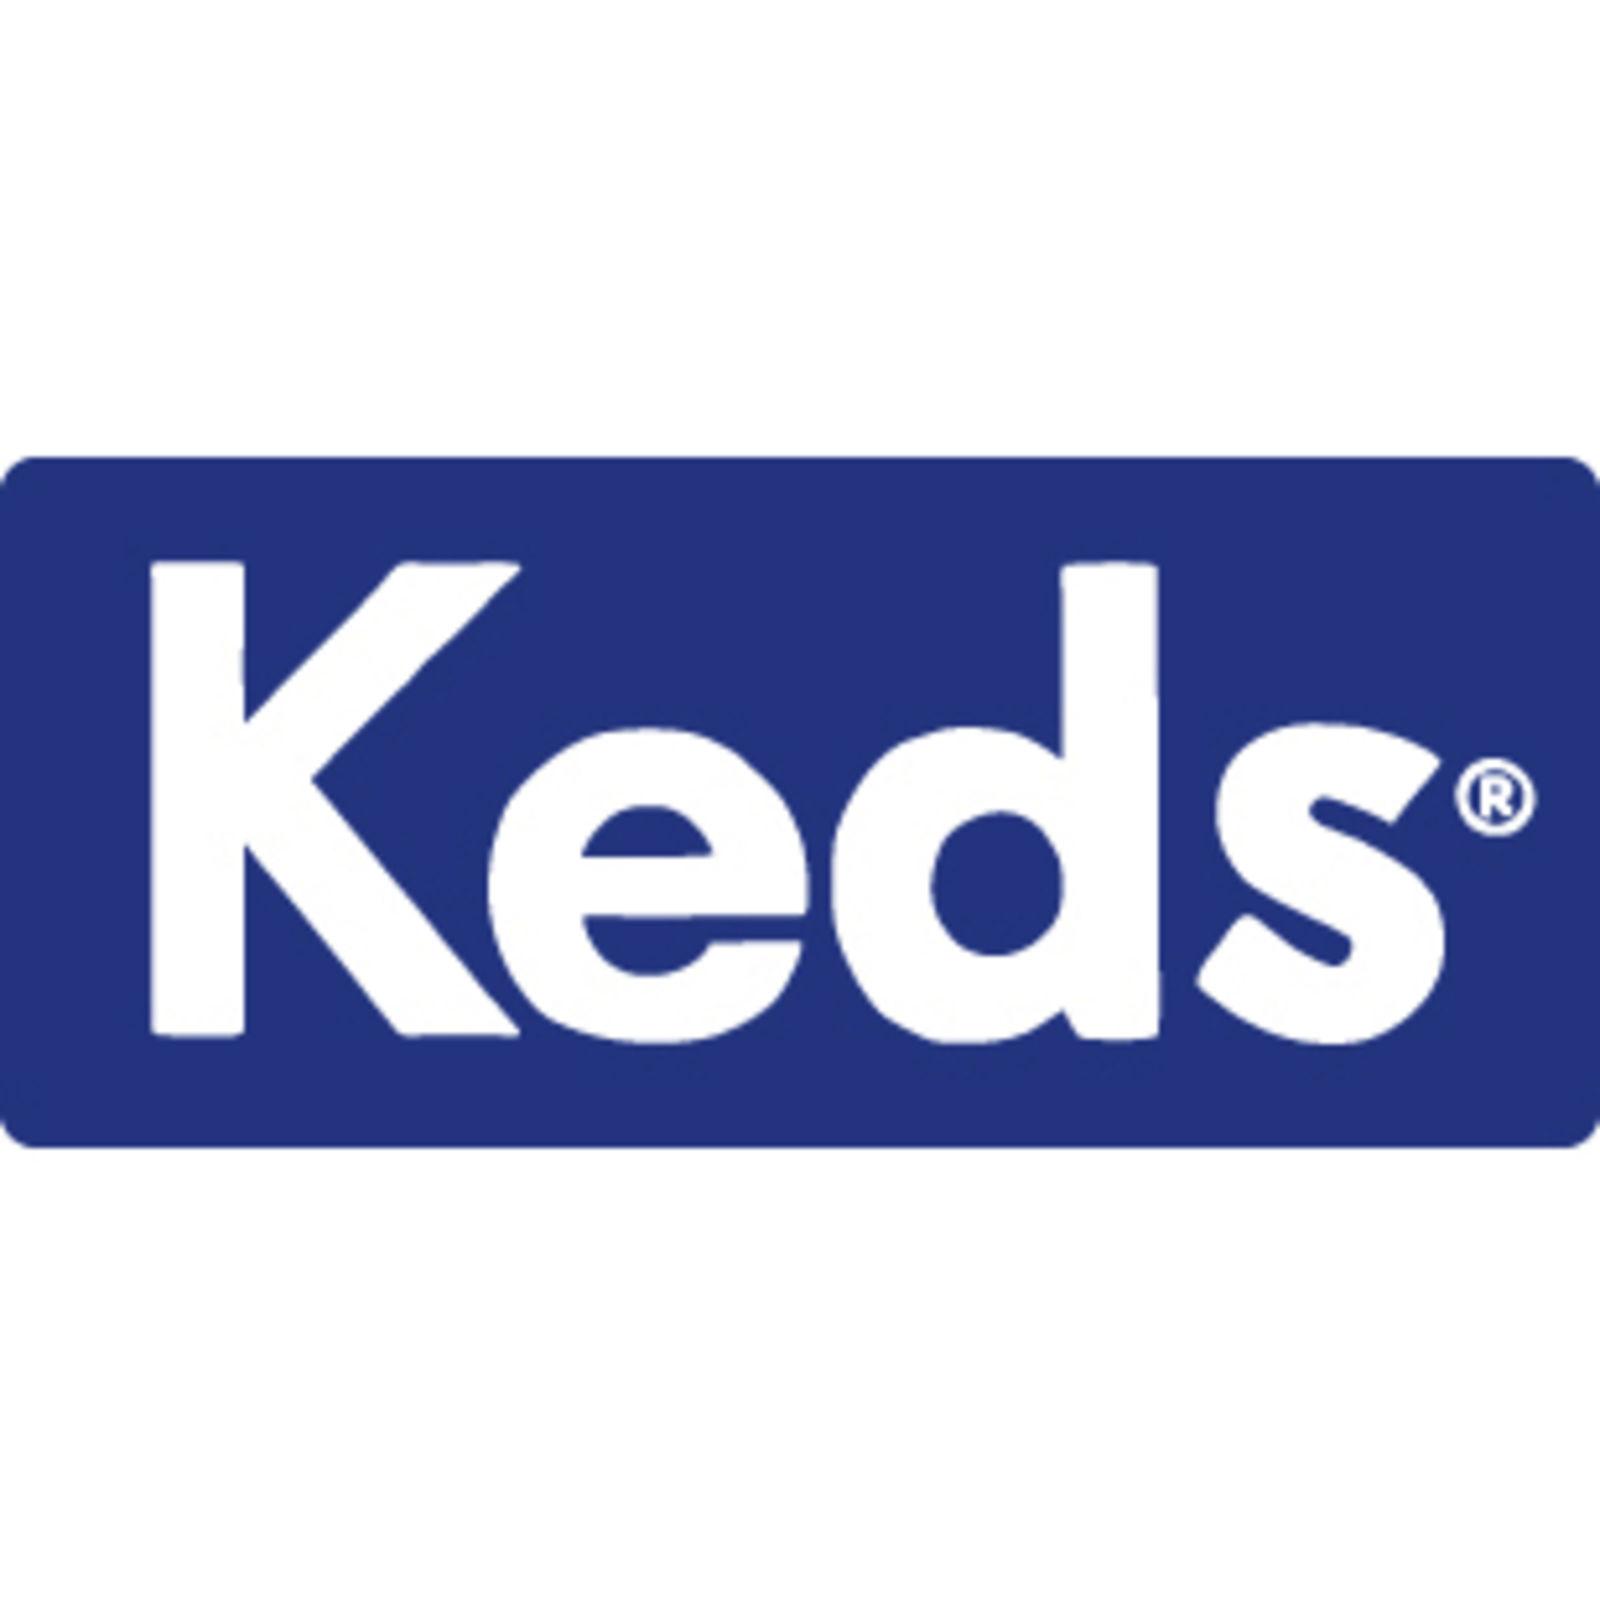 Keds (Image 1)